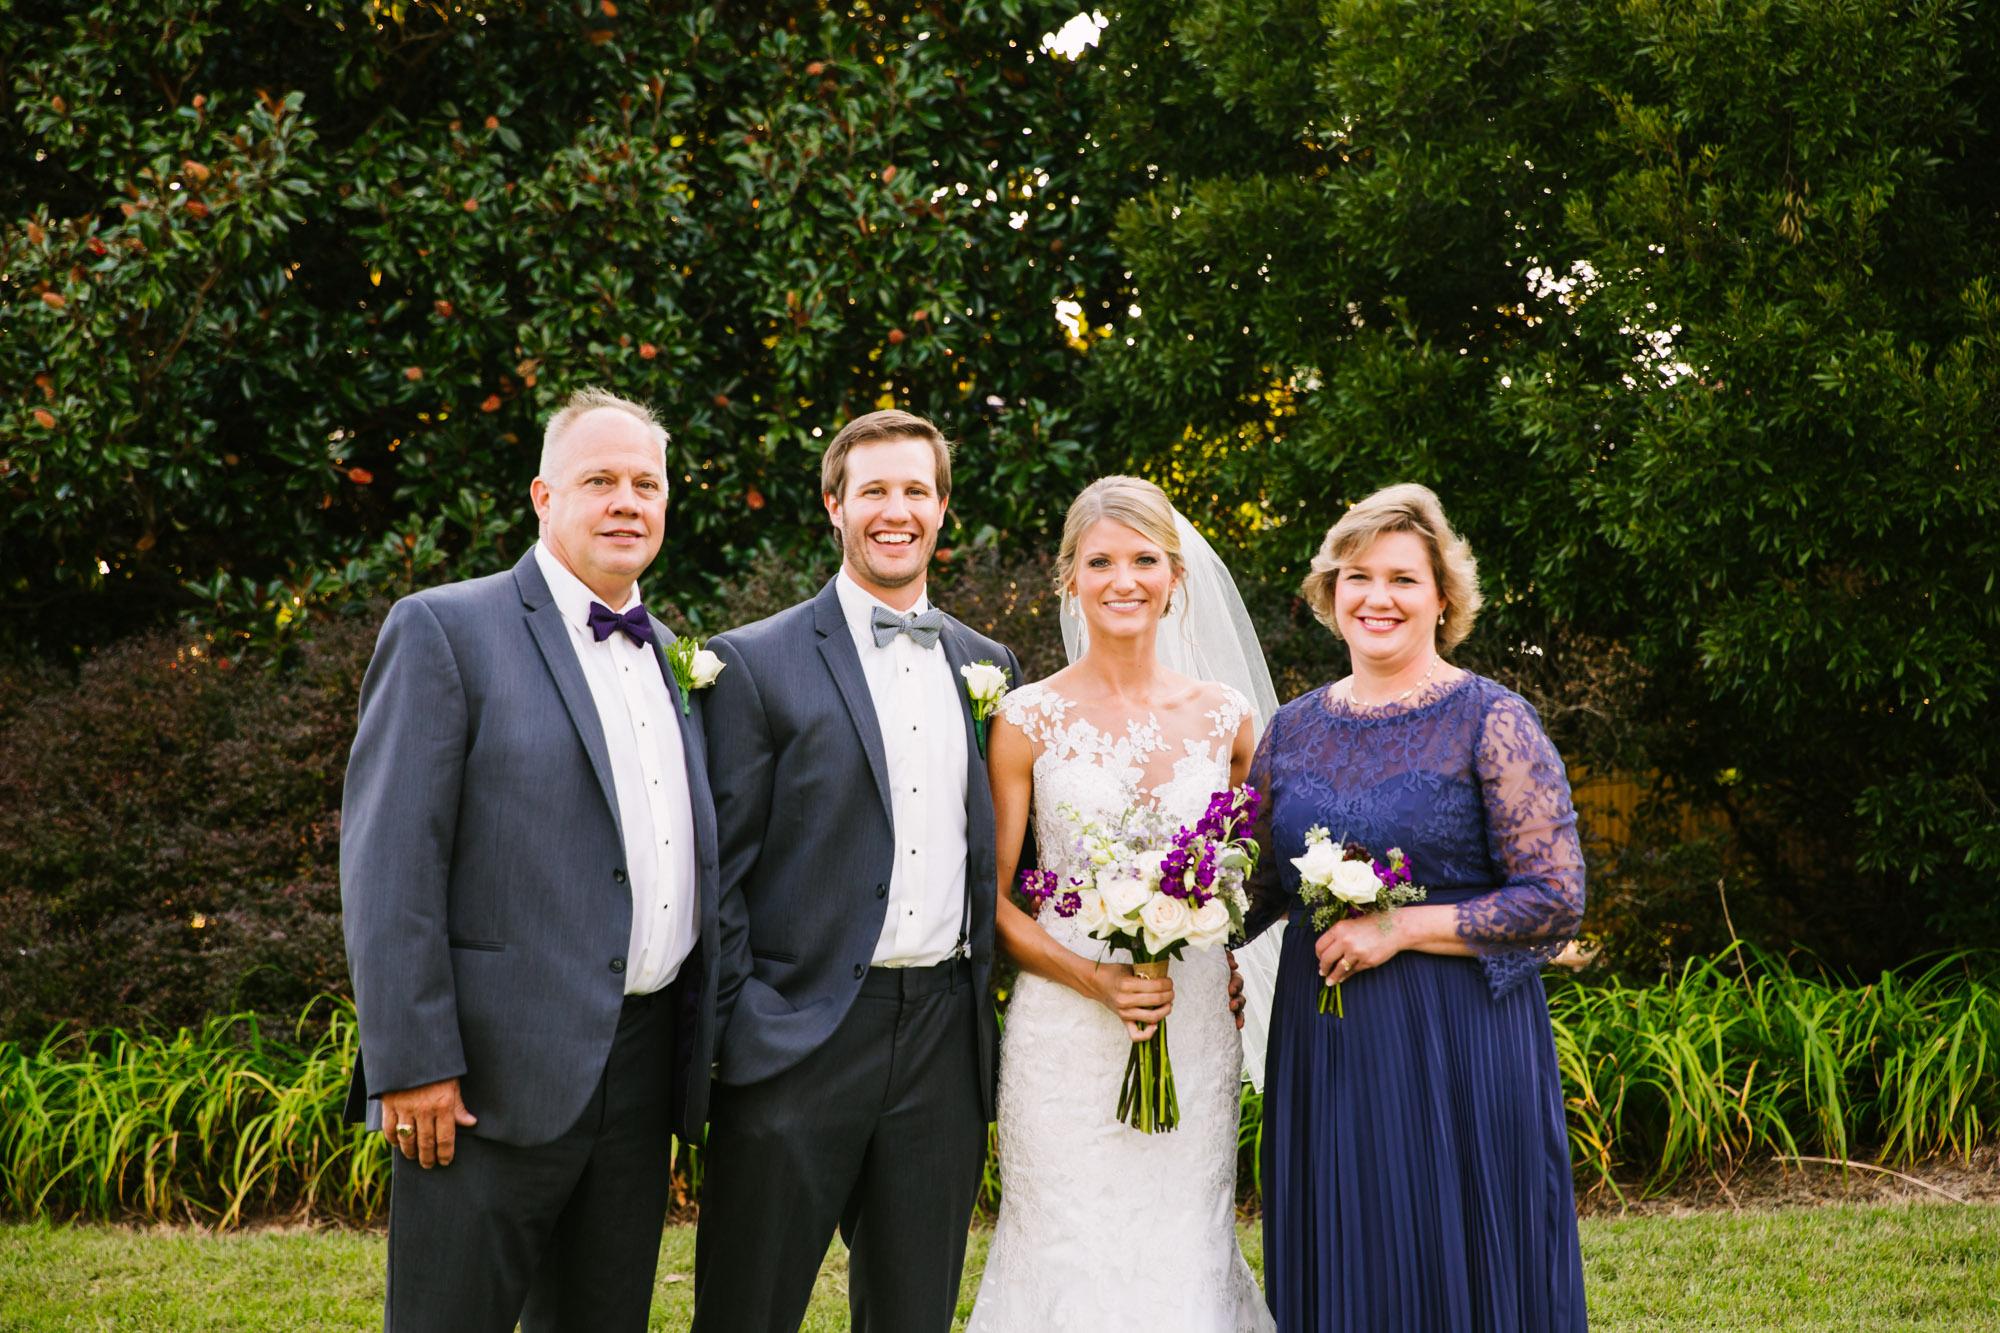 Waynesville, NC Wedding Photography | Wedding Family Portrait